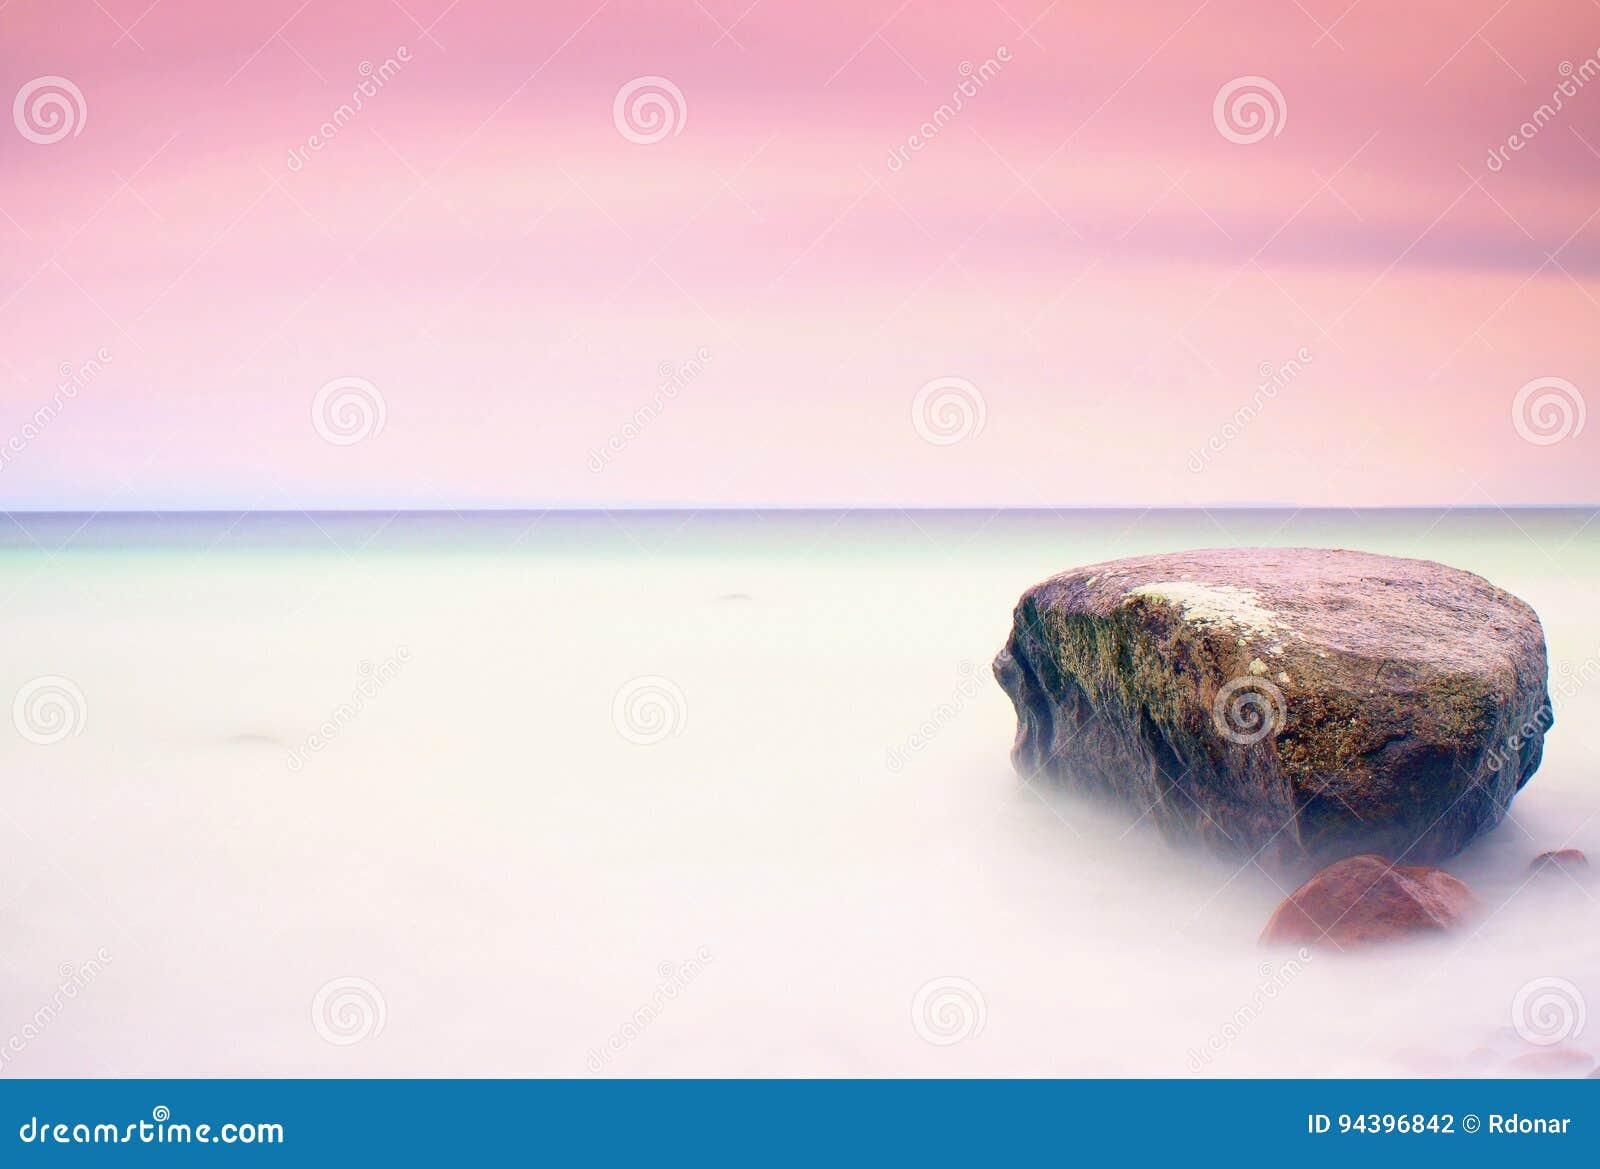 Romantische Atmosphäre am ruhigen Morgen in Meer Große Flusssteine, die heraus vom glatten gewellten Meer haften Rosa Horizont